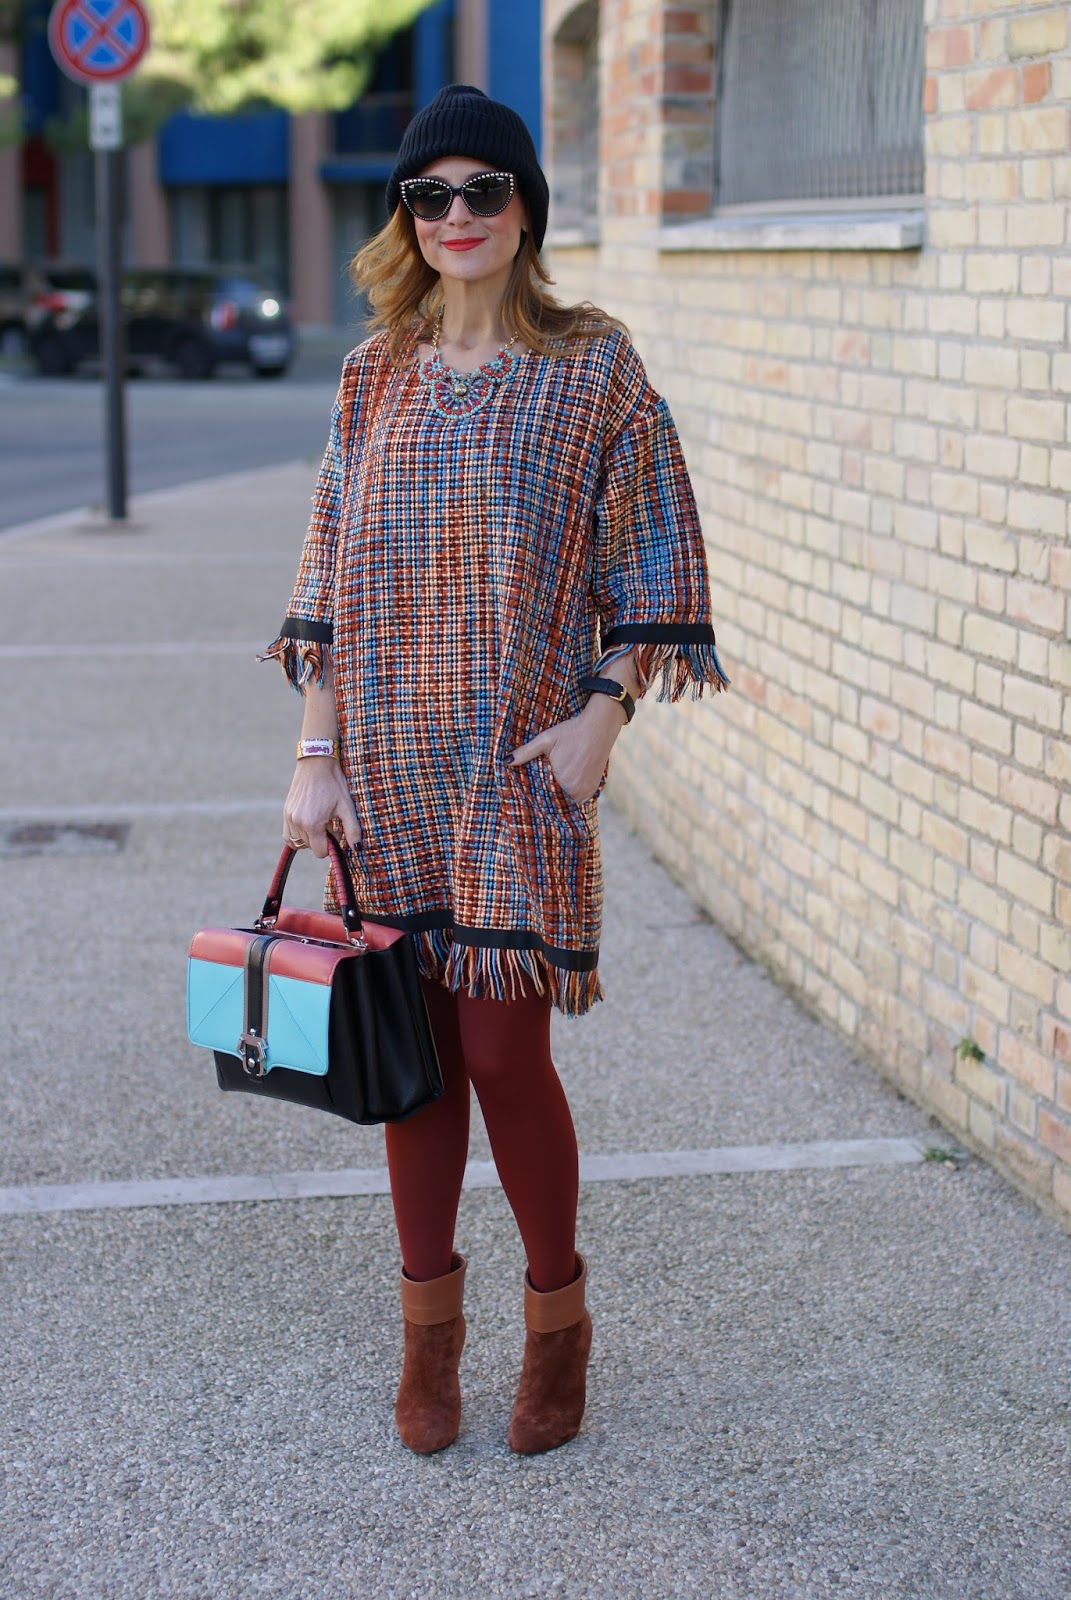 Vogos Gigi dress, Le Silla rust ankle boots and Paula Cademartori Faye bag on Fashion and Cookies fashion blog, fashion blogger style